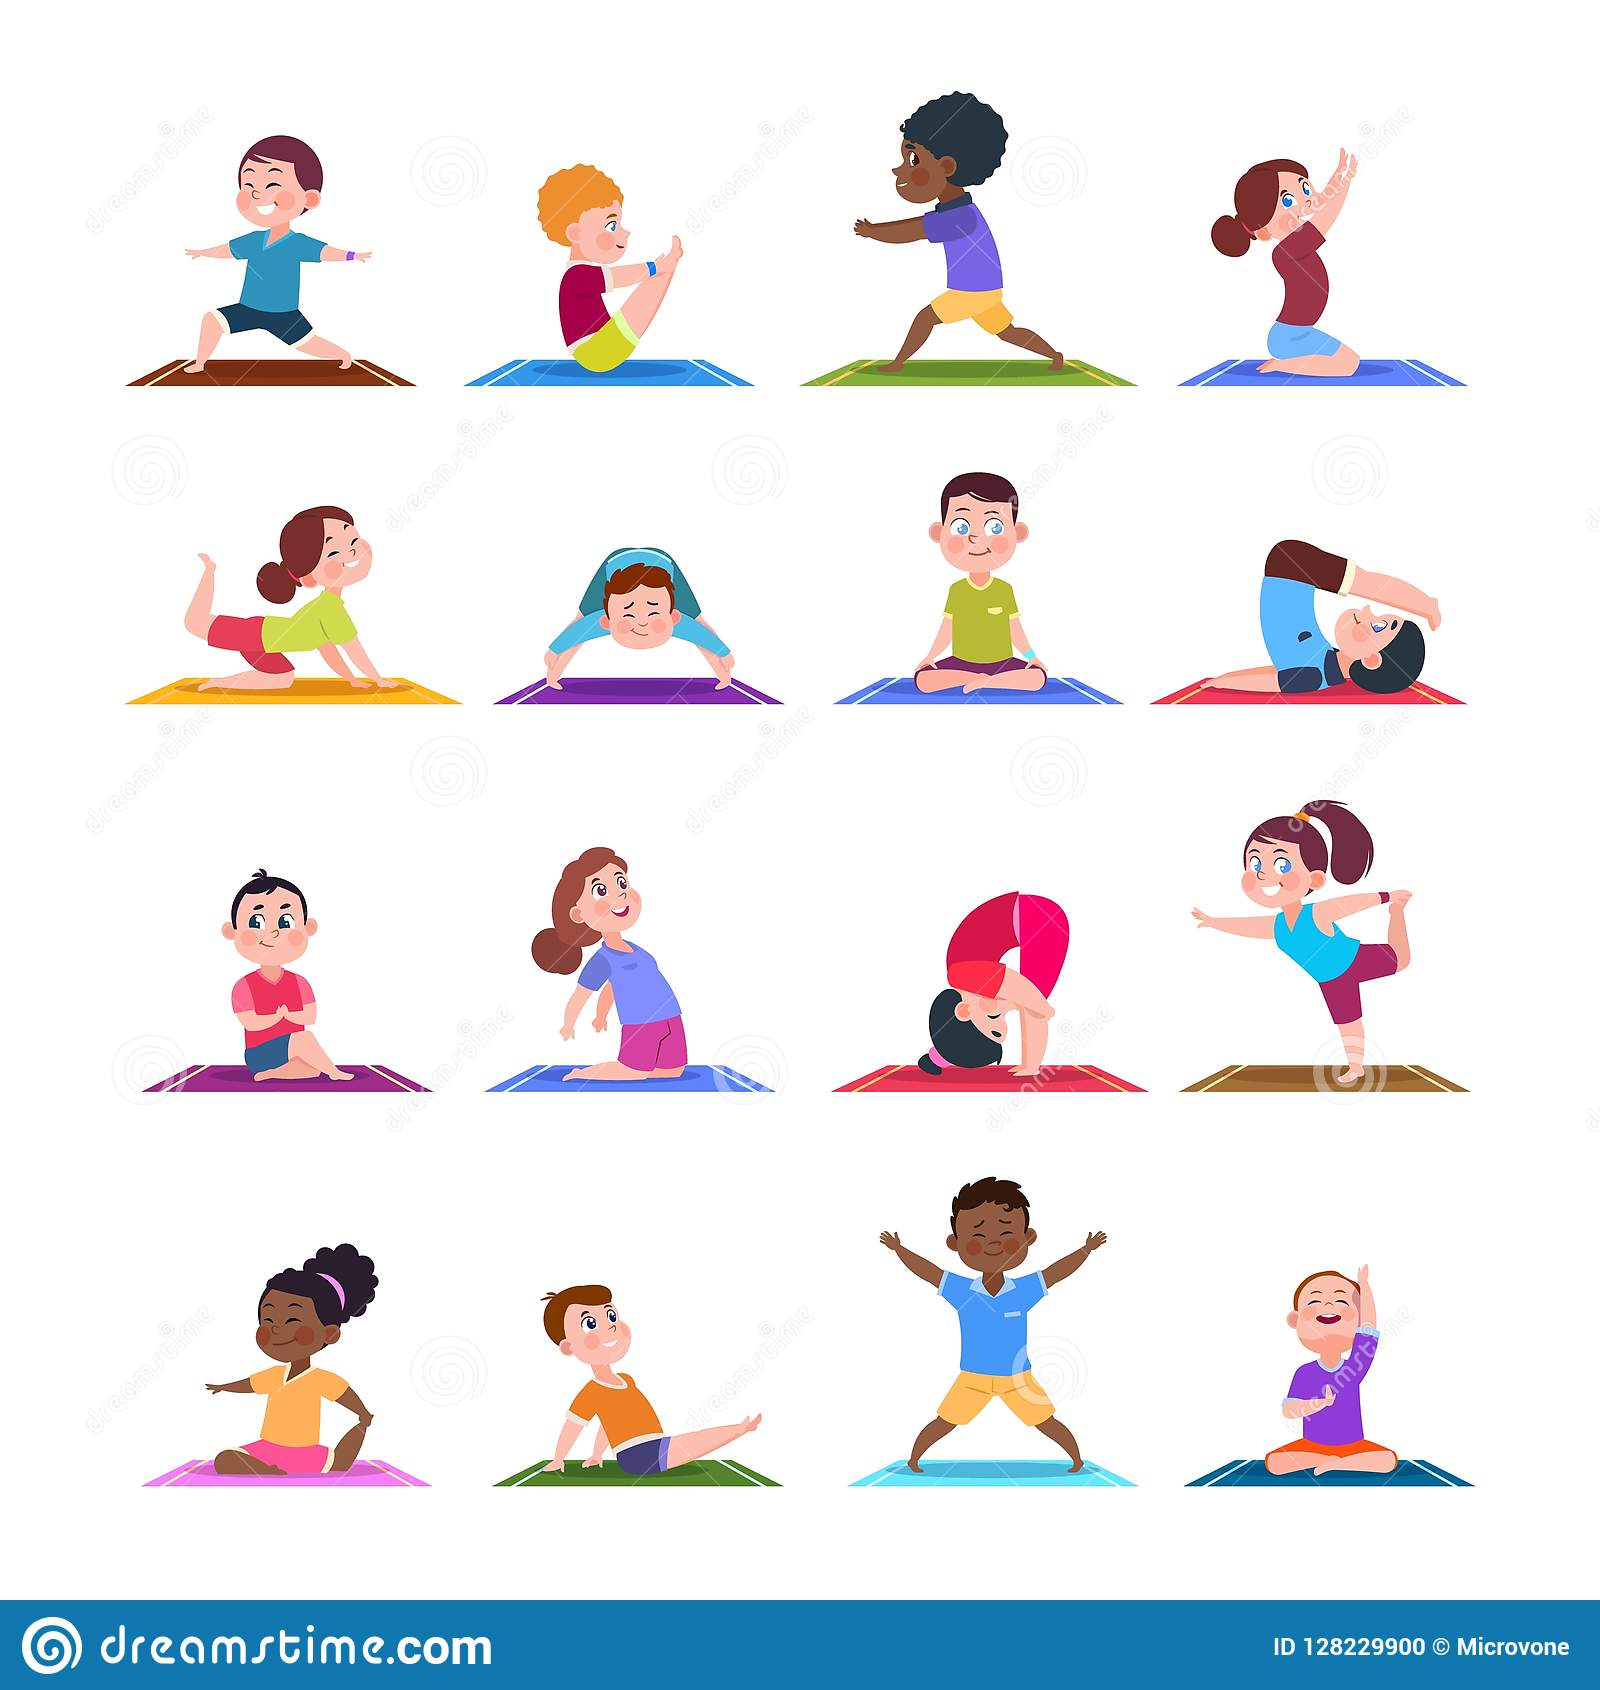 Children In Yoga Poses Cartoon Fitness Kids In Yoga Asana